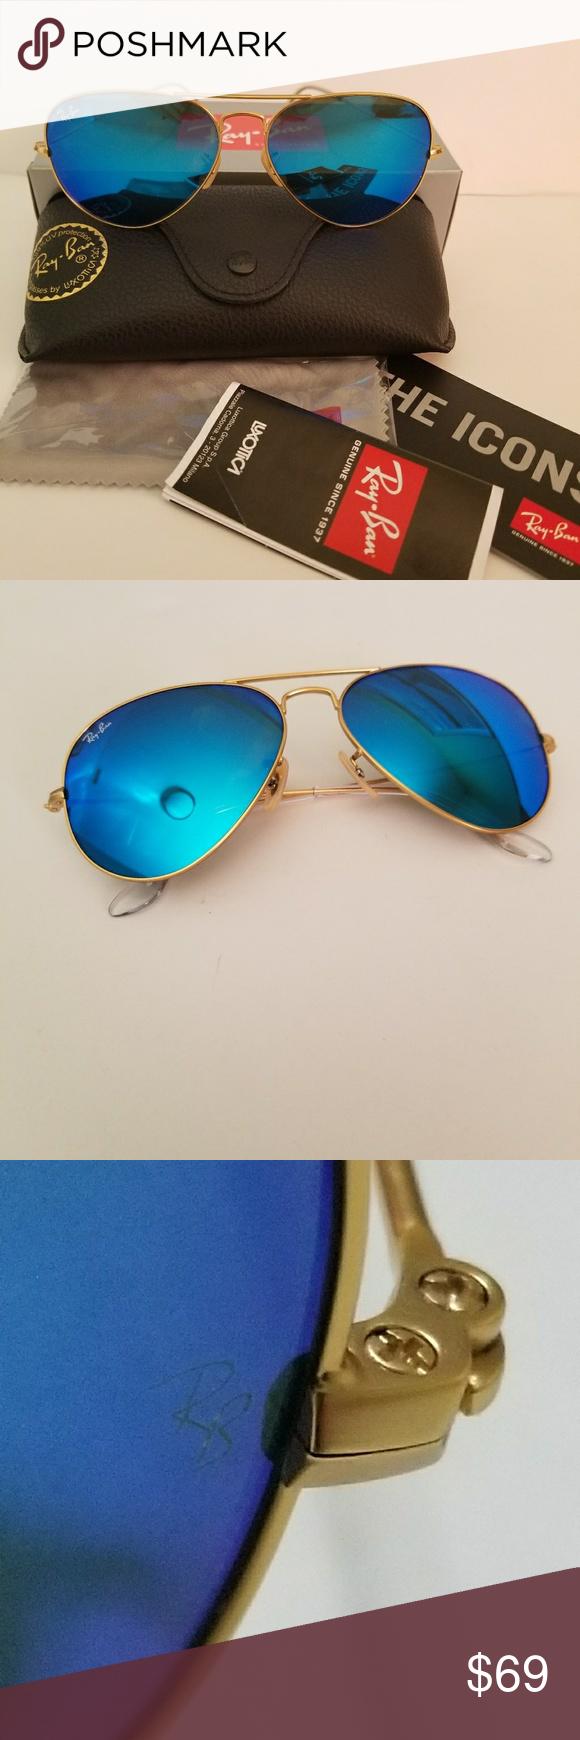 Ray ban aviator style mirror blue